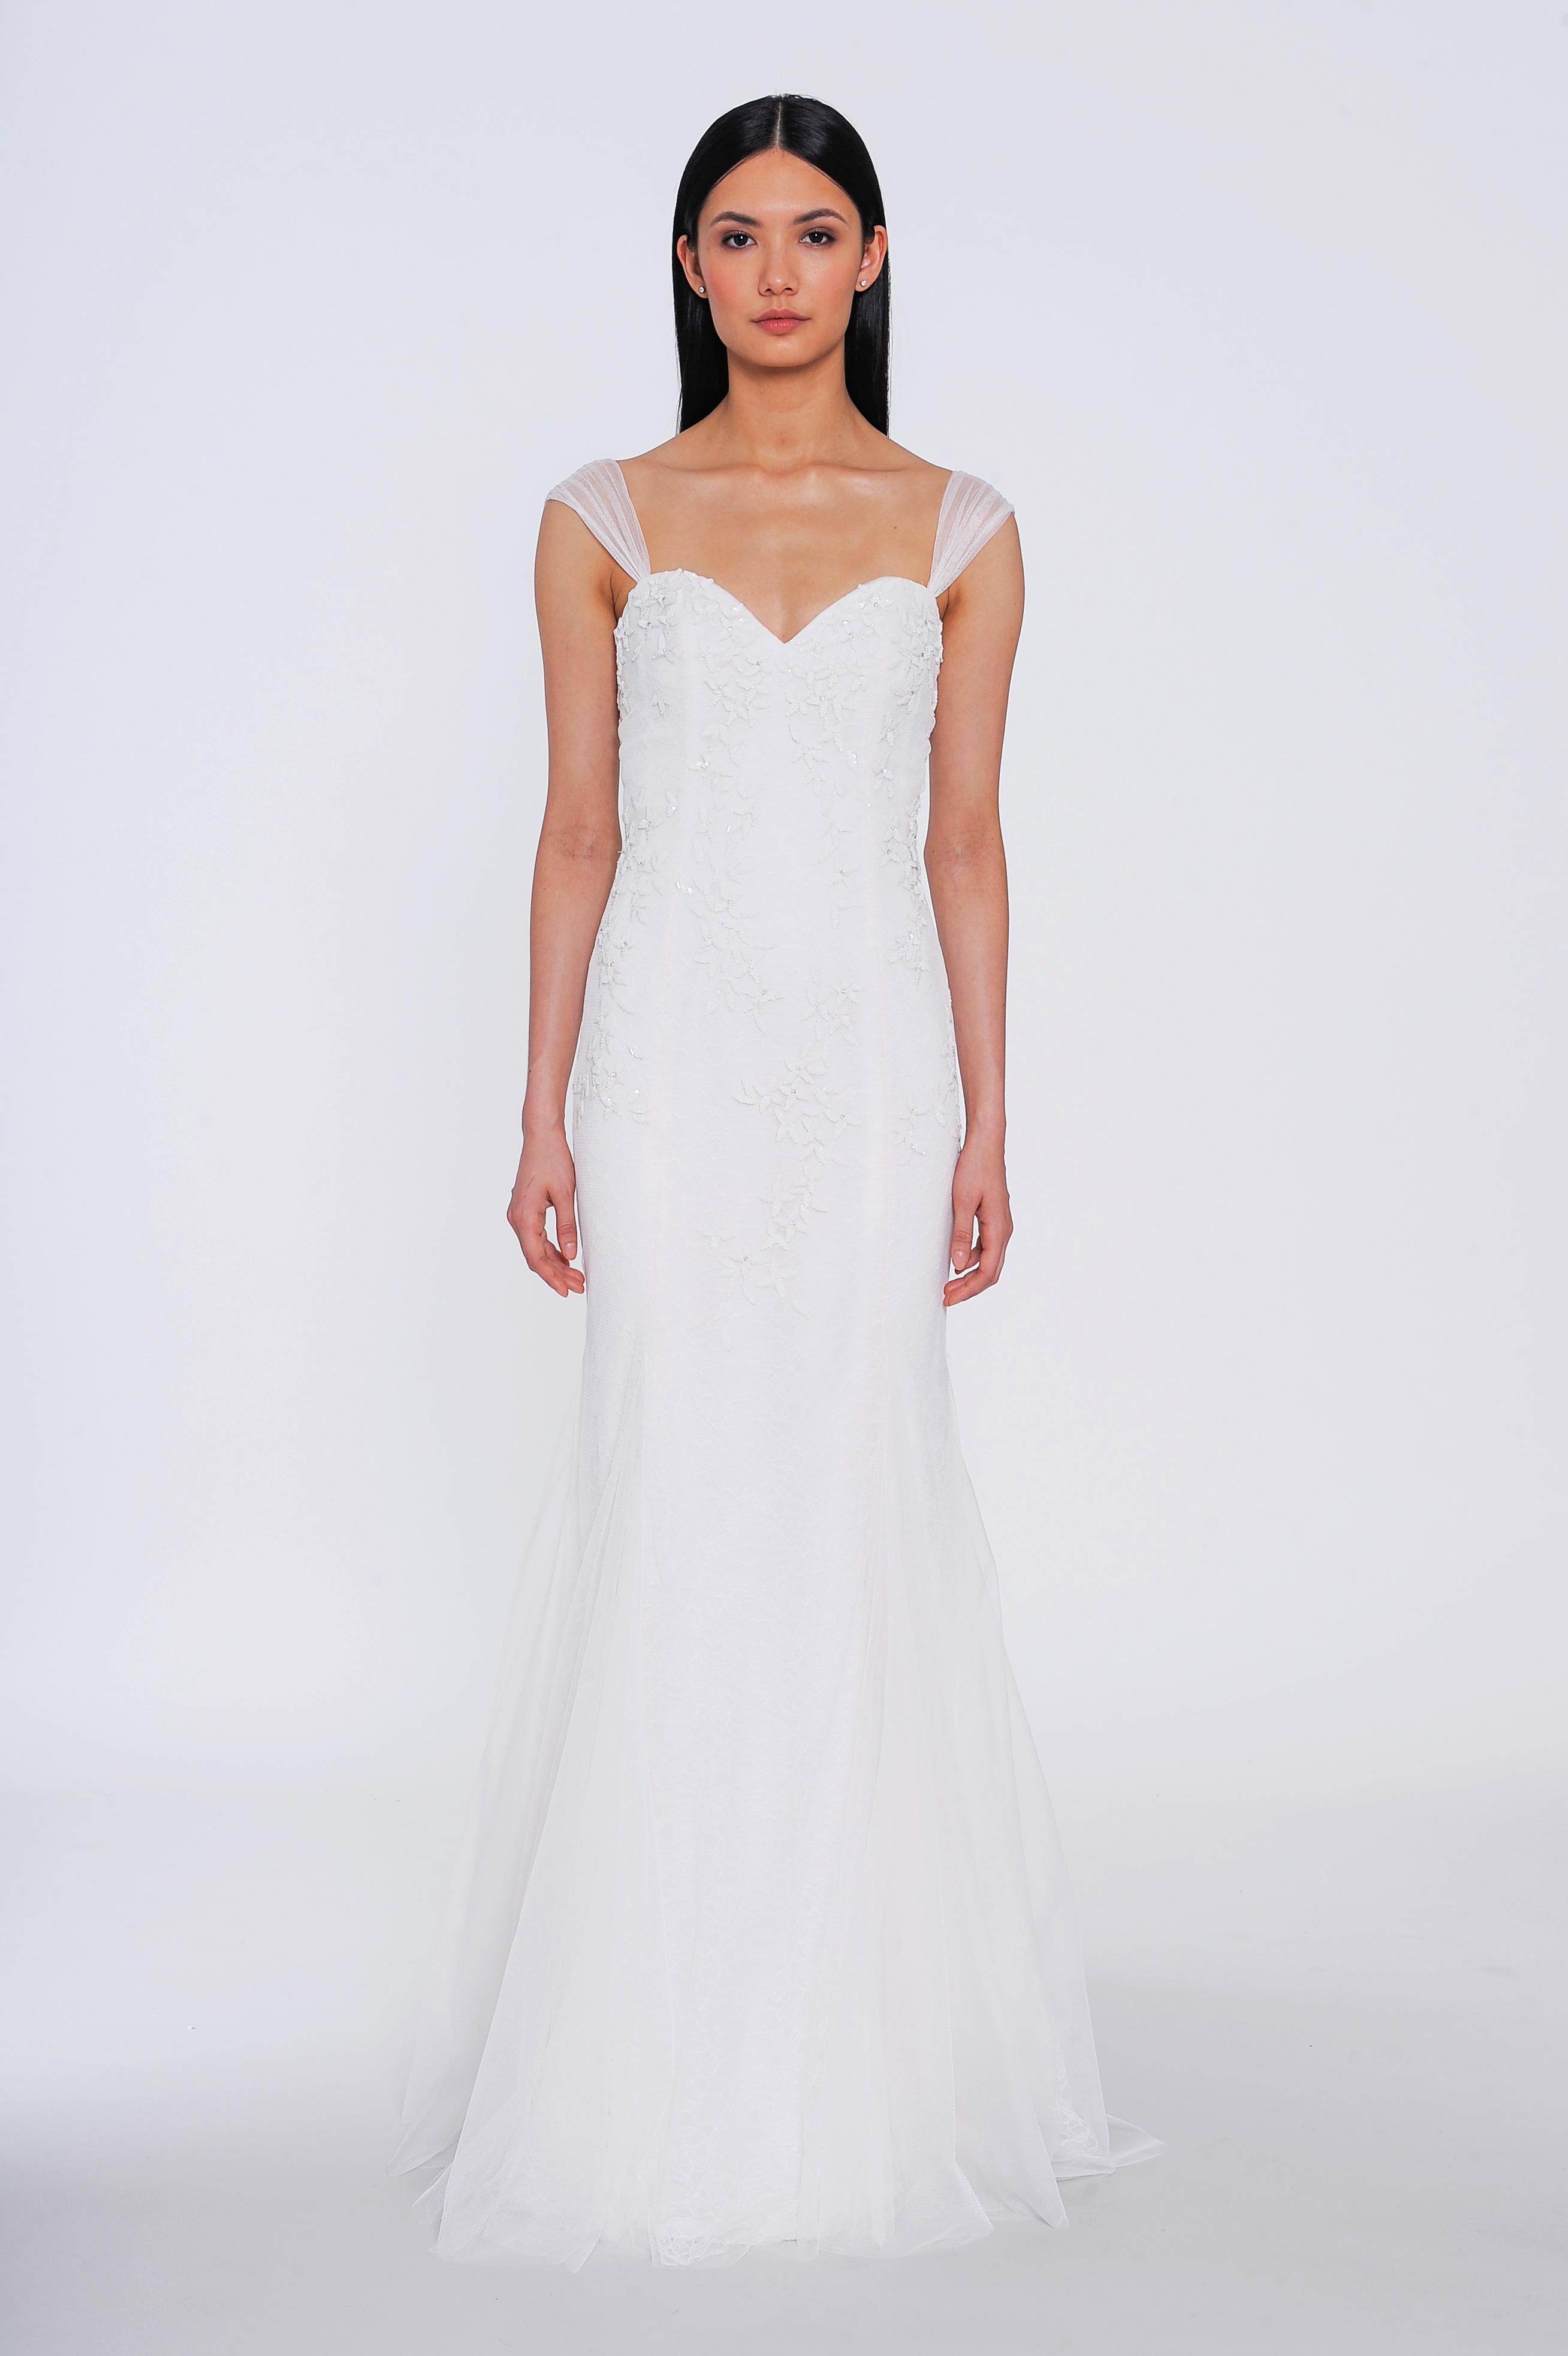 allison webb wedding dress spring 2019 tulle sheath